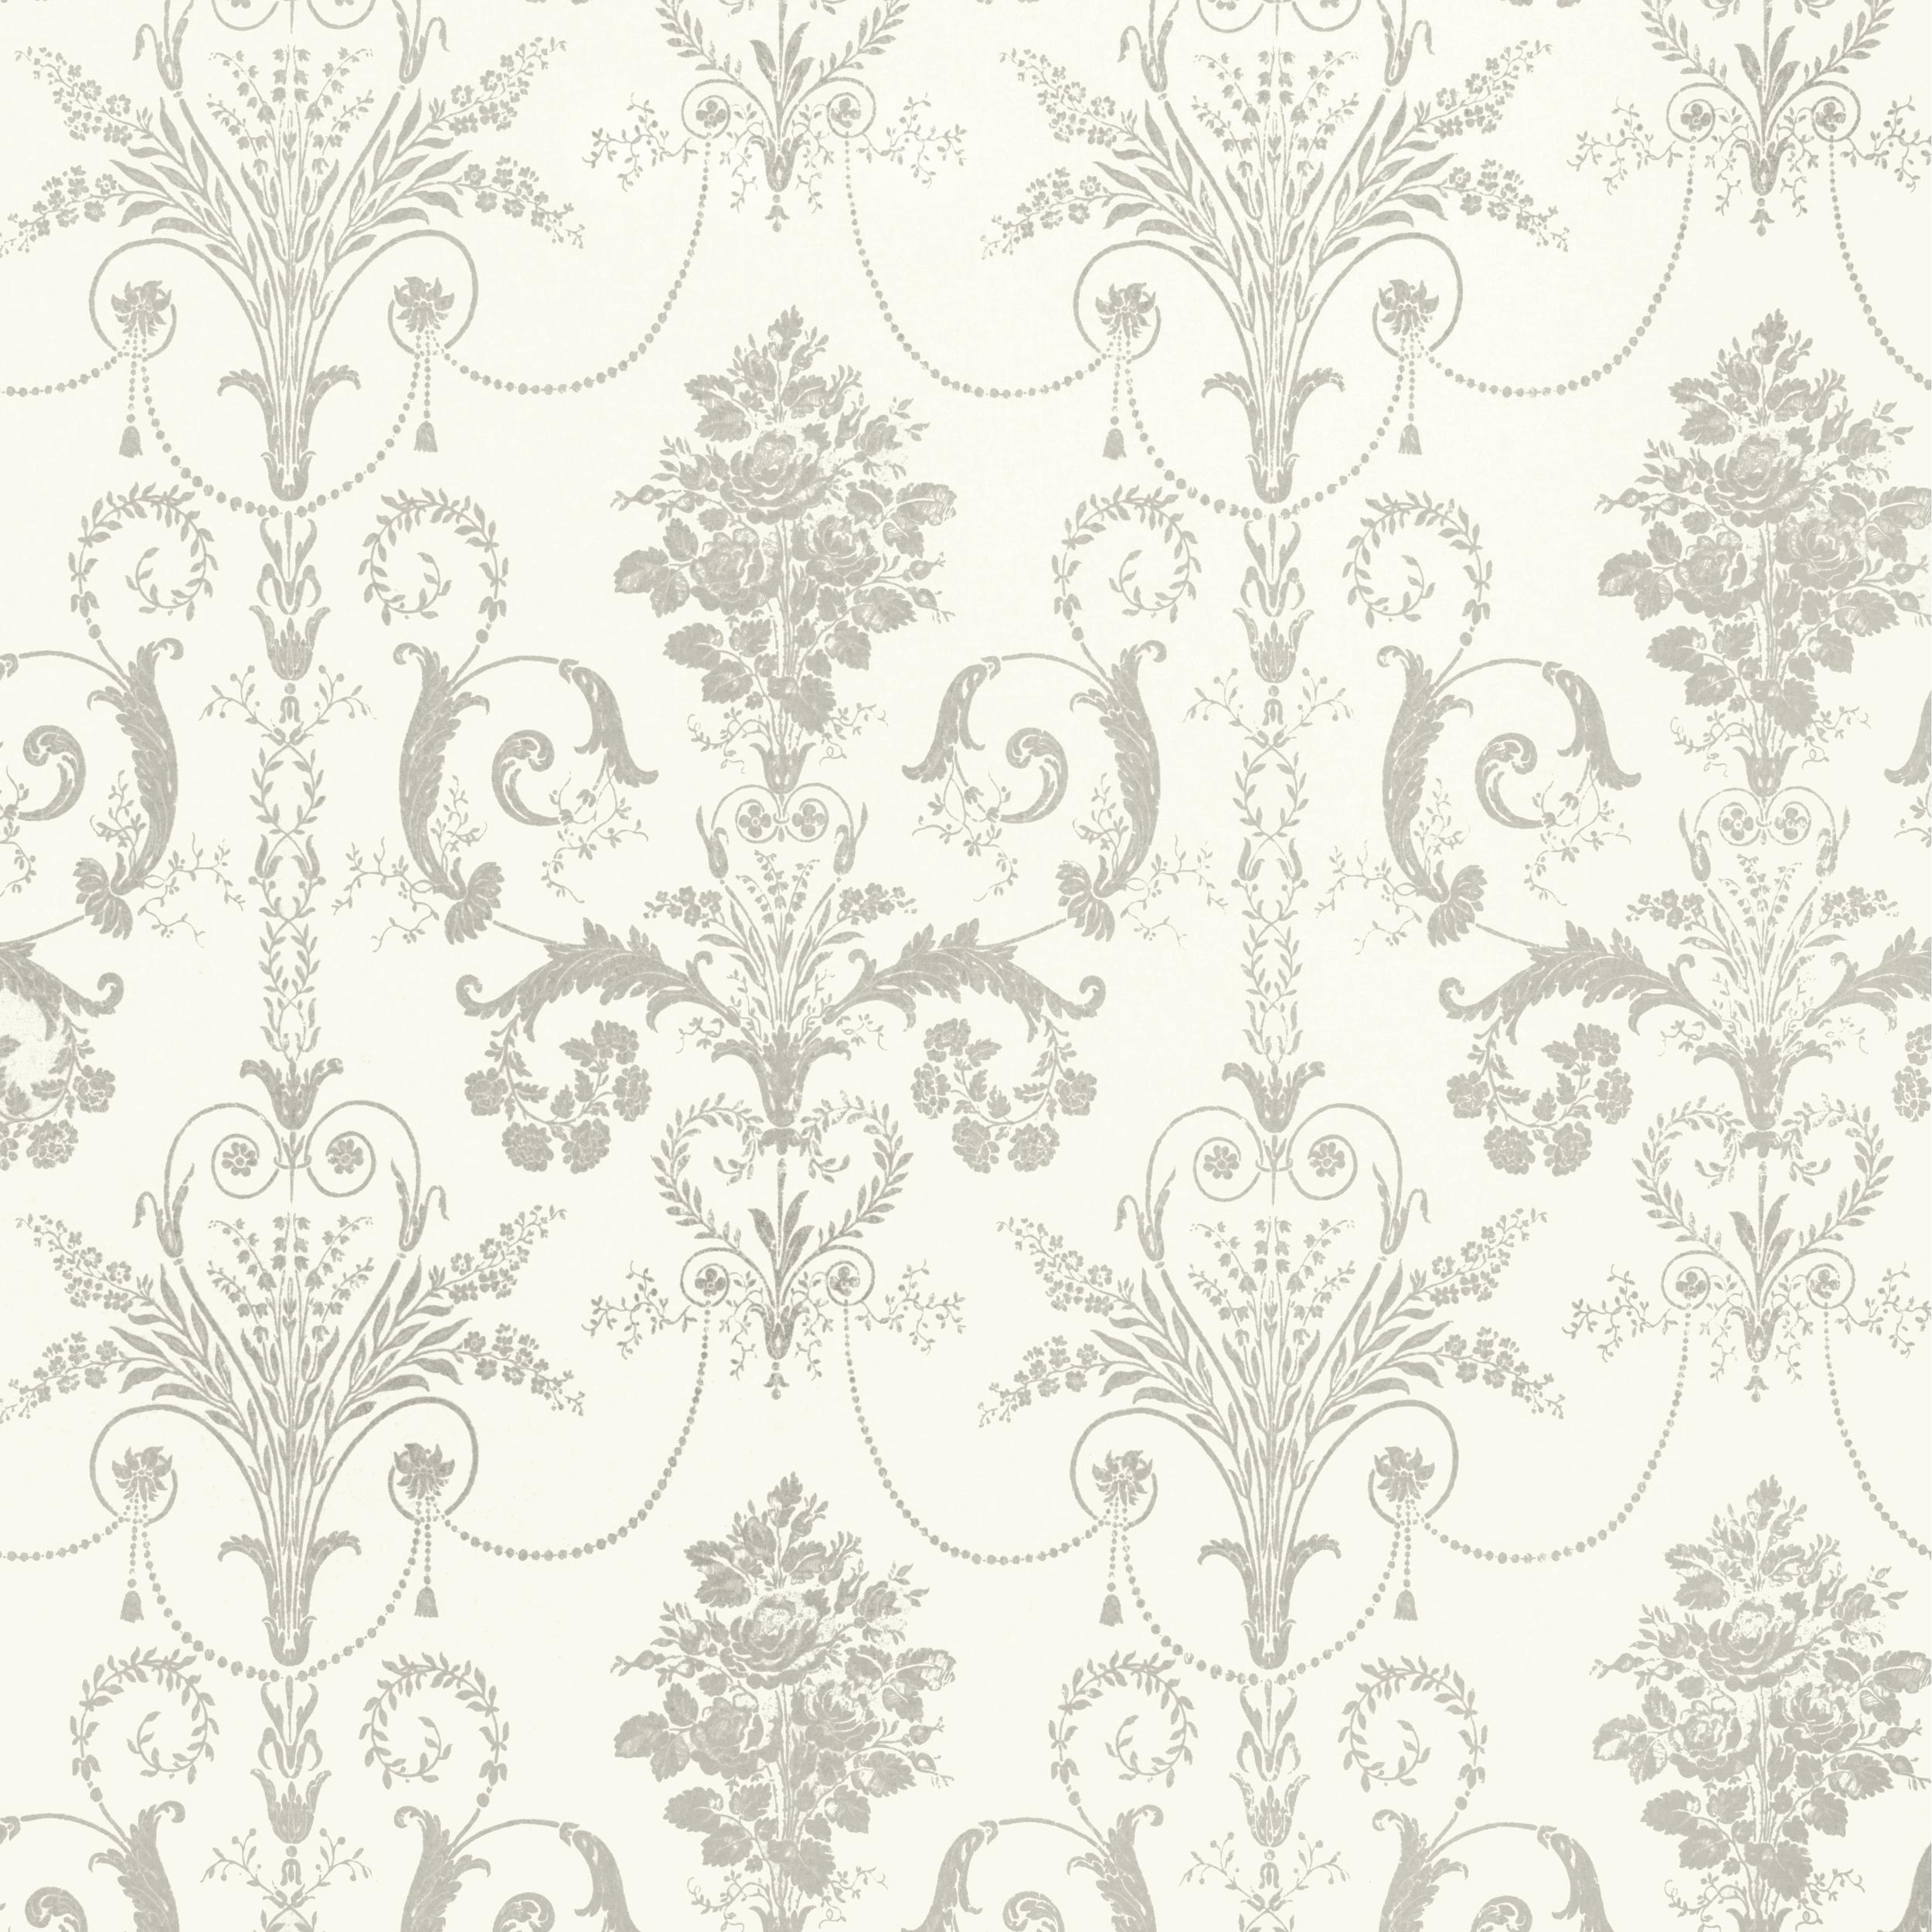 Home Decorating Wallpaper Josette Dove GreyWhite Wallpaper 2500x2500